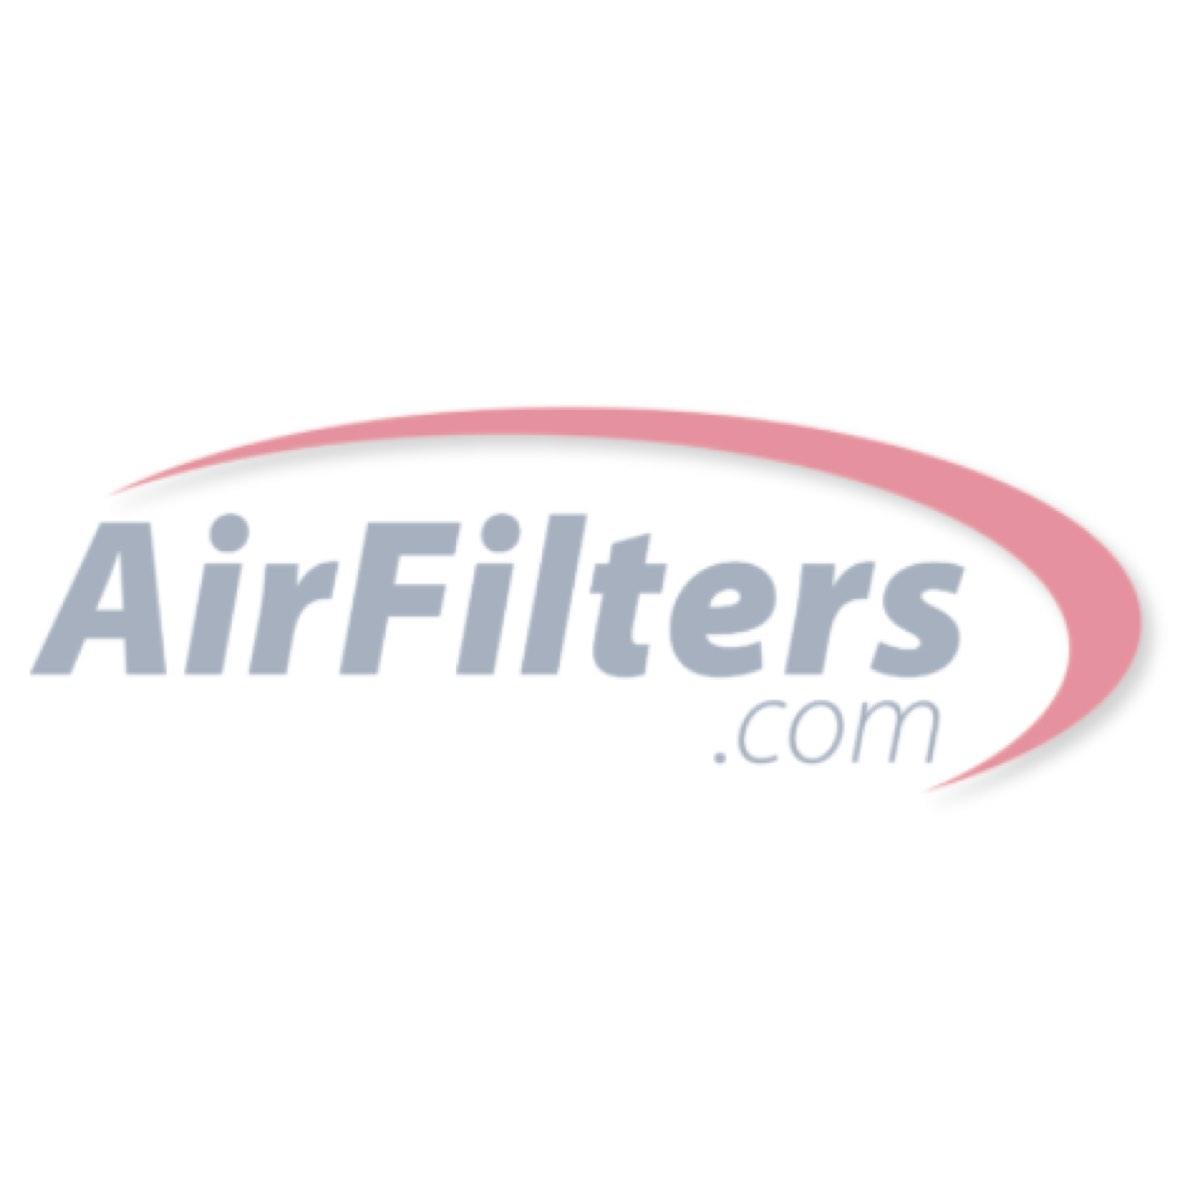 24x25x4.5 (23.75x24.38x4.38) Carrier® EZ Flex Filters by Accumulair®